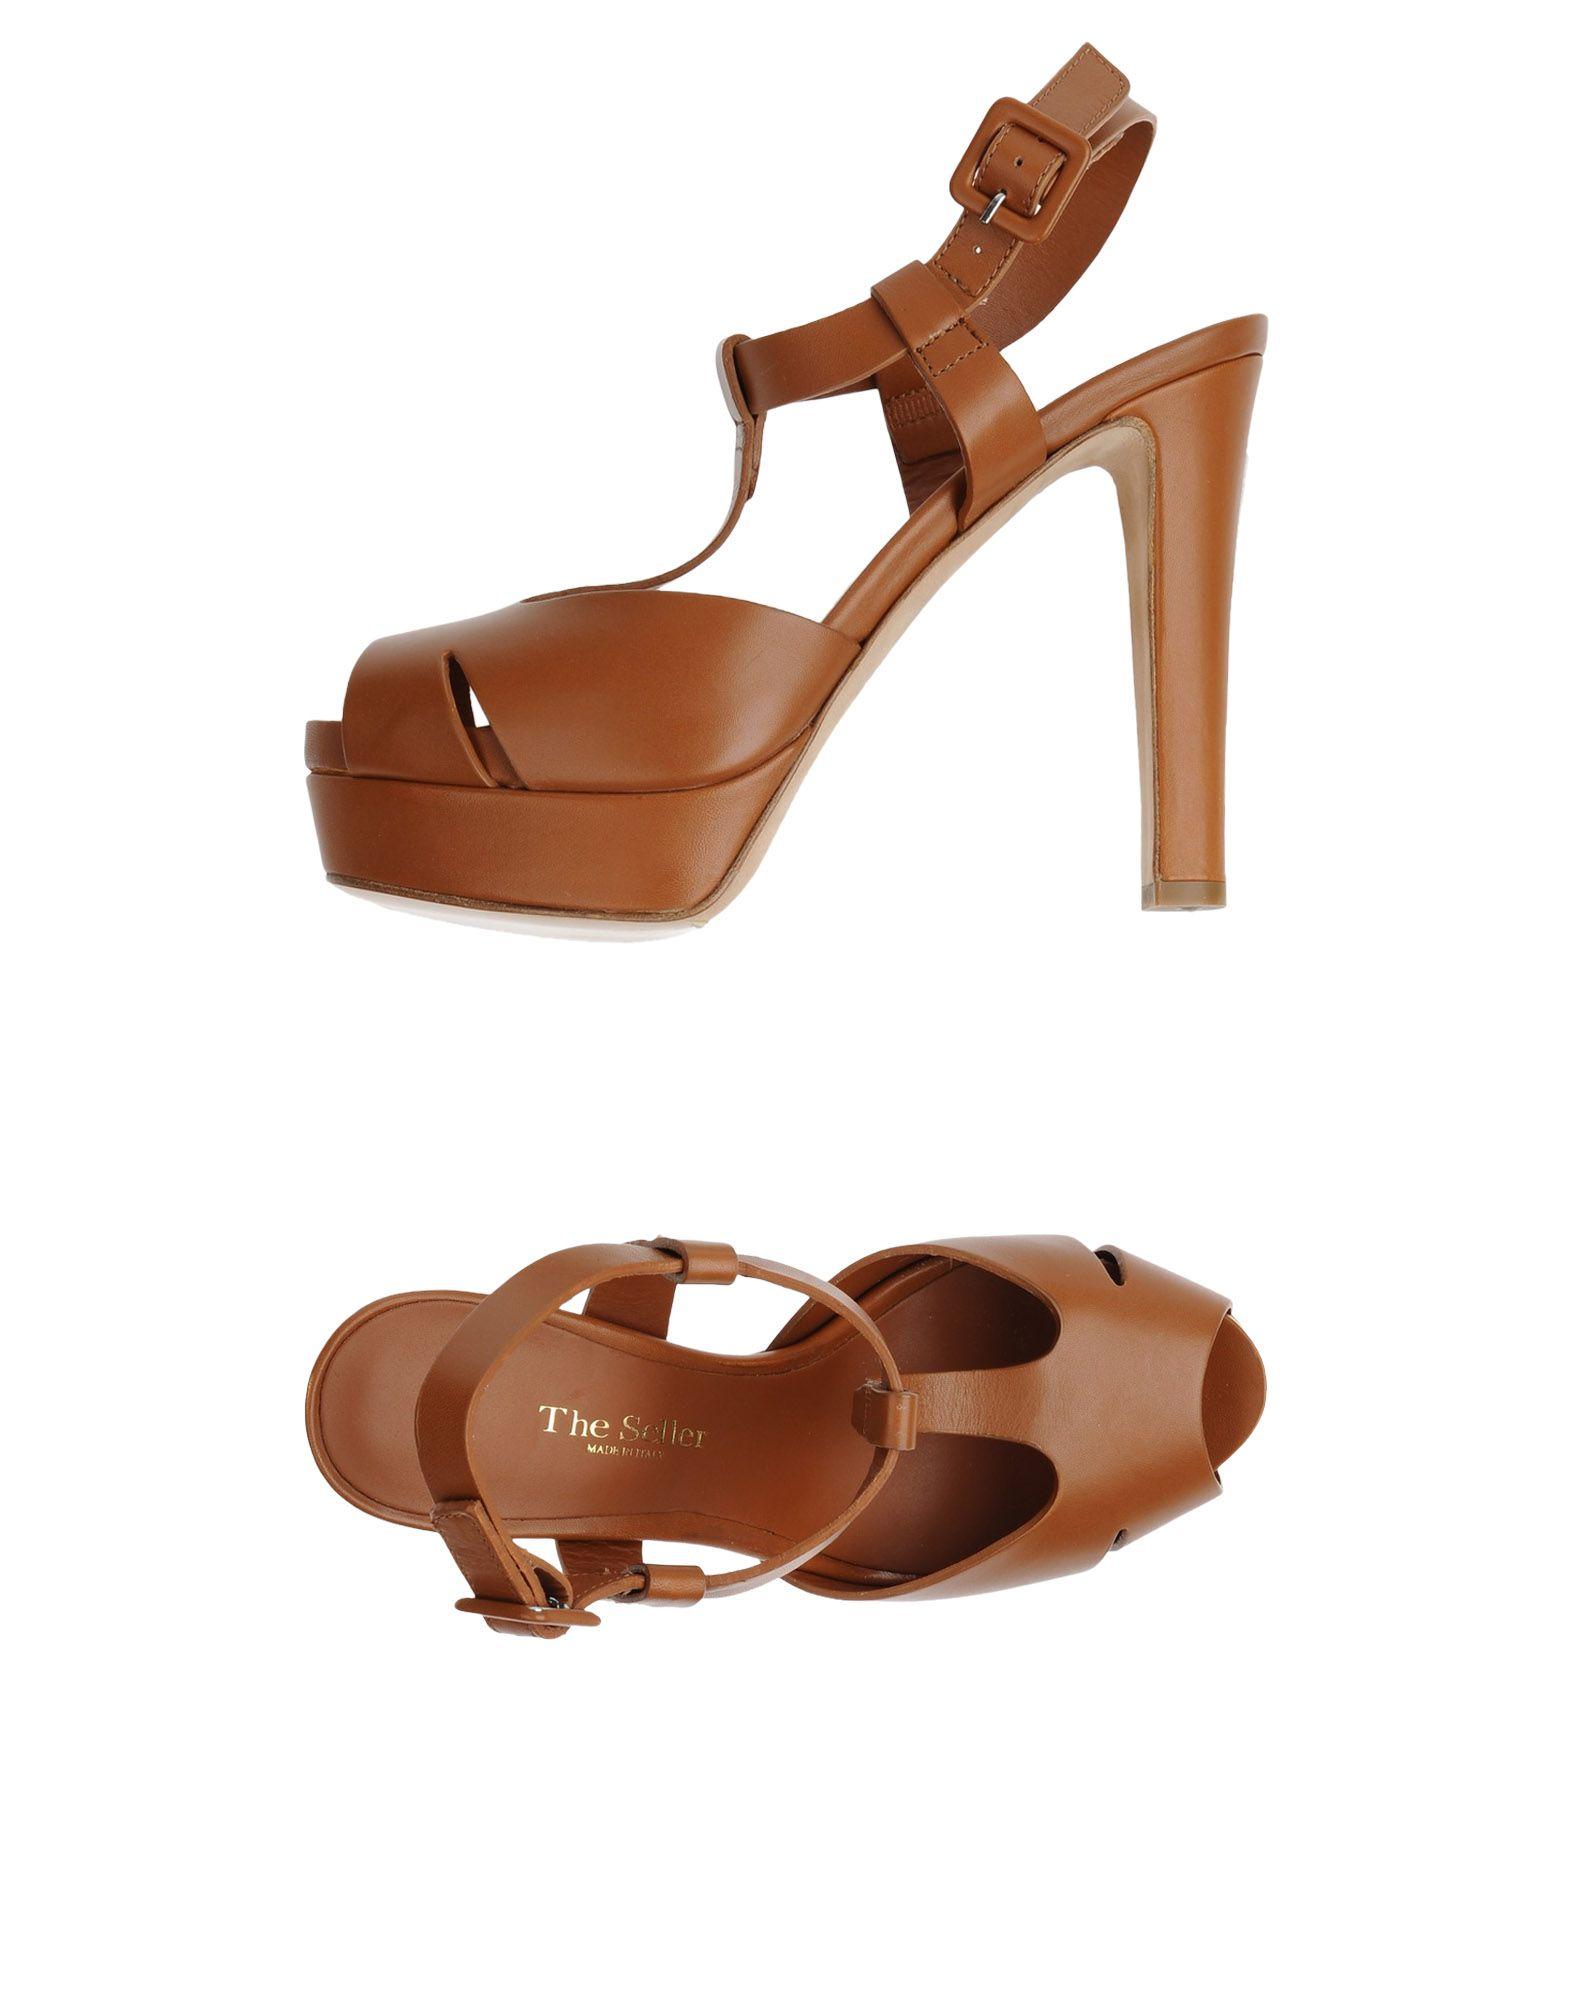 THE SELLER Damen Sandale Farbe Lederfarben Größe 5 jetztbilligerkaufen